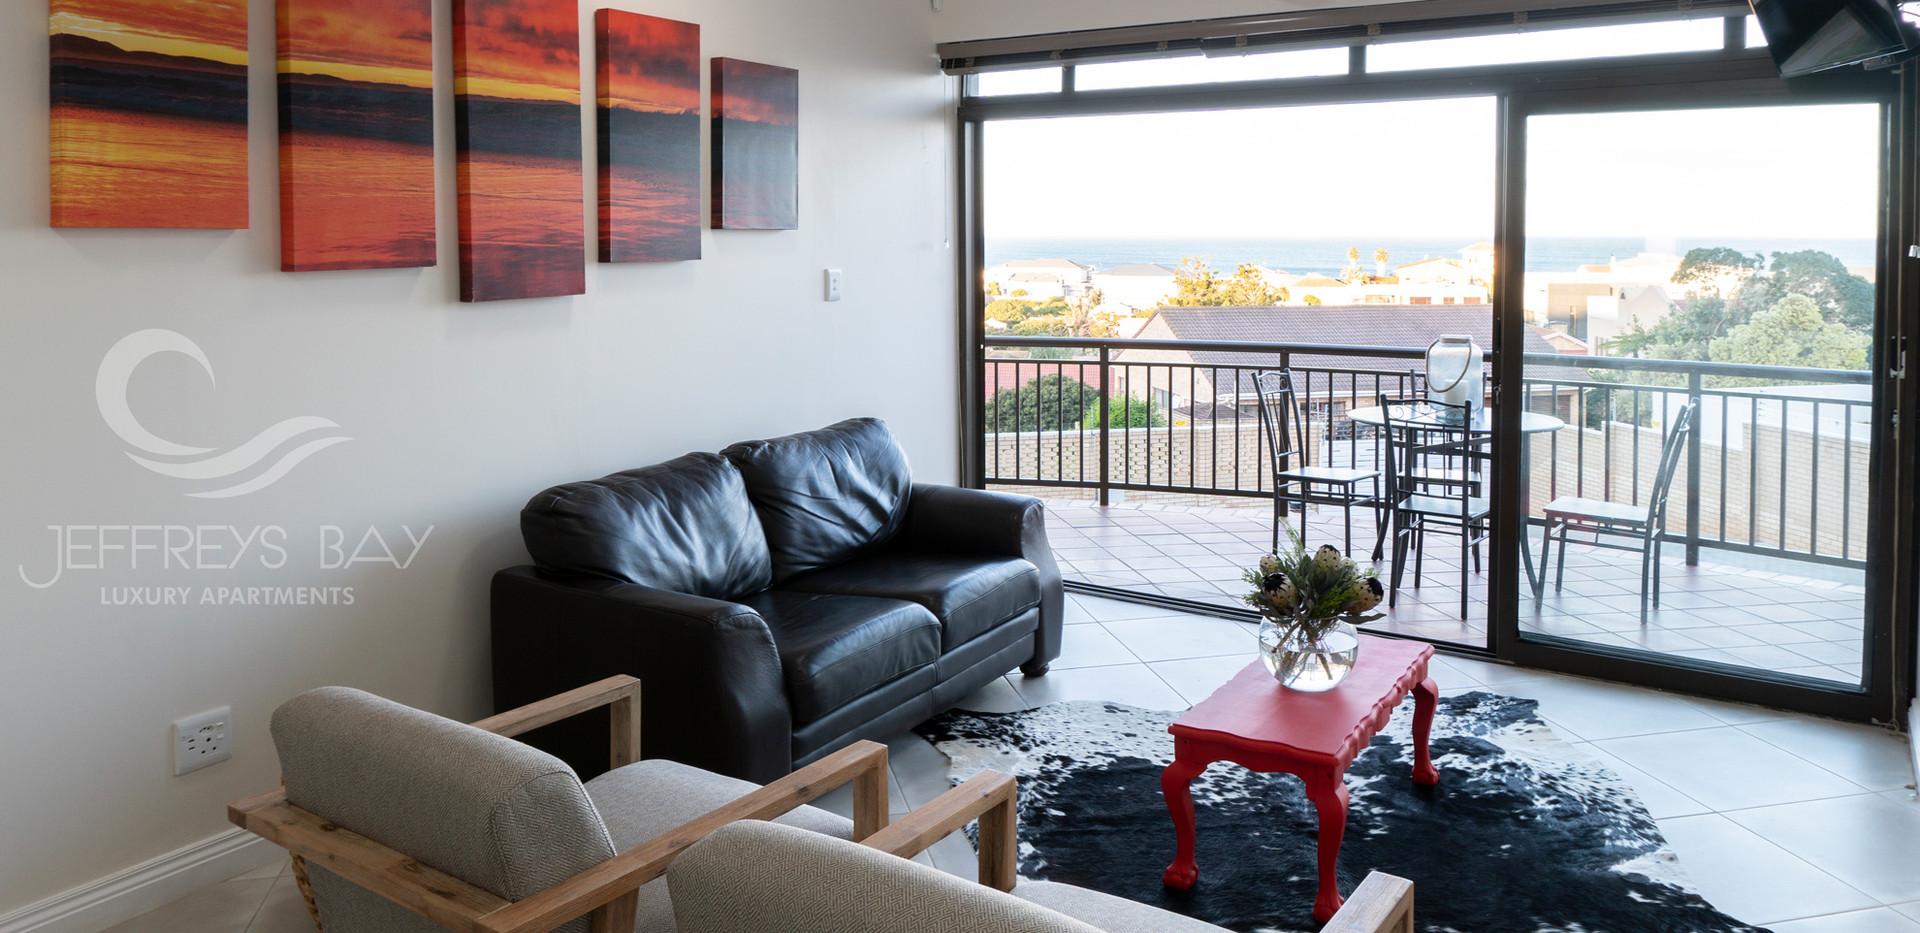 Jeffreysbay_Lux_apartments_Unit6_Lounge_